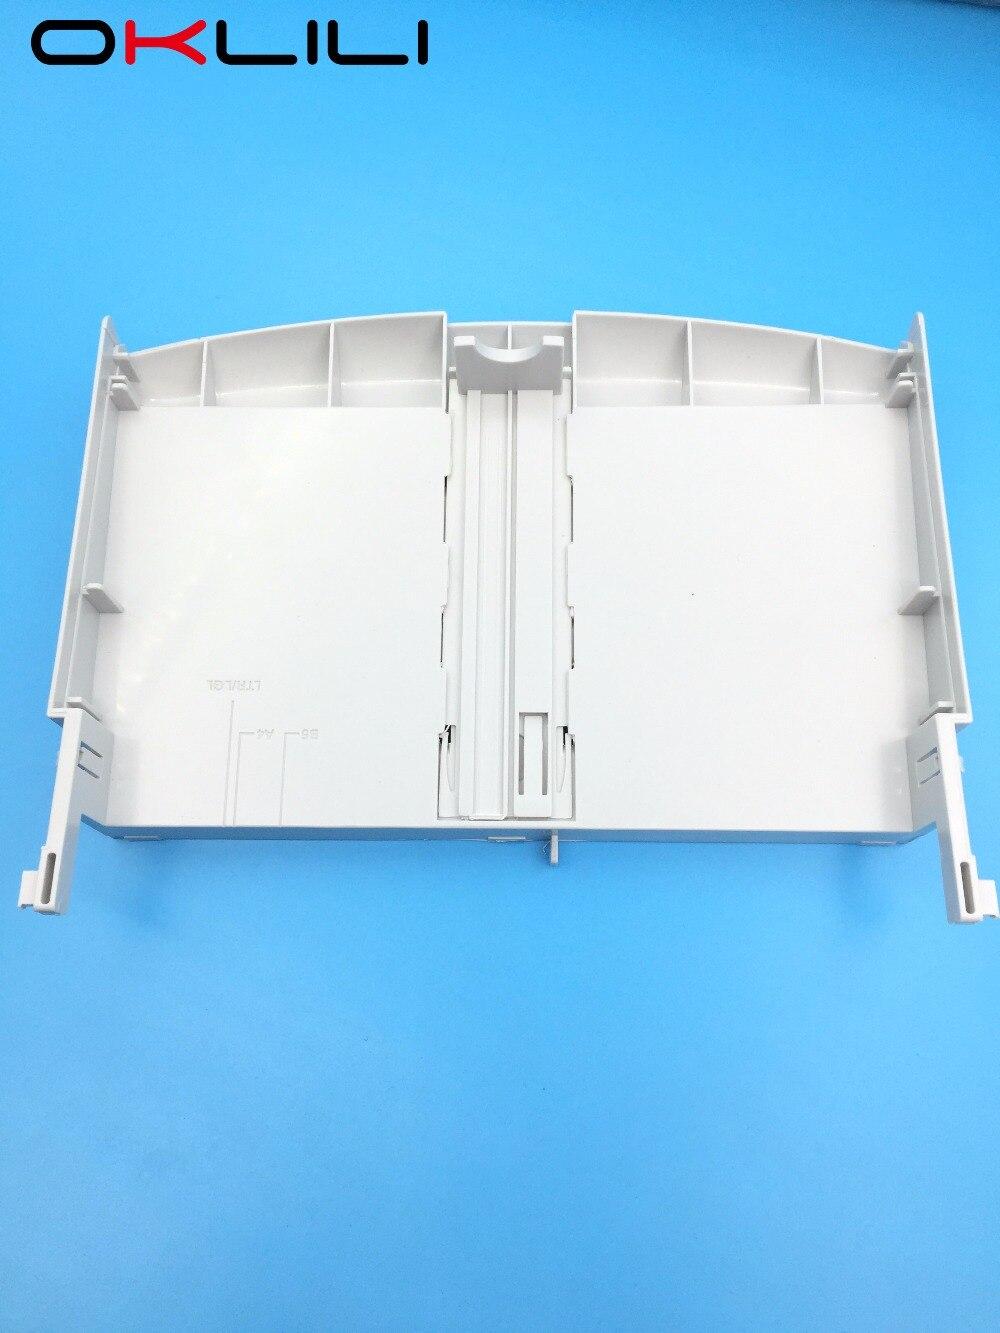 RG0-1121-000 RG0-1013 RG0-1013-000 RM1-0553 RM1-0554 Paper Input Tray For HP 1000 1200 1220 1300 1150 3300 3310 3320 3330 3380